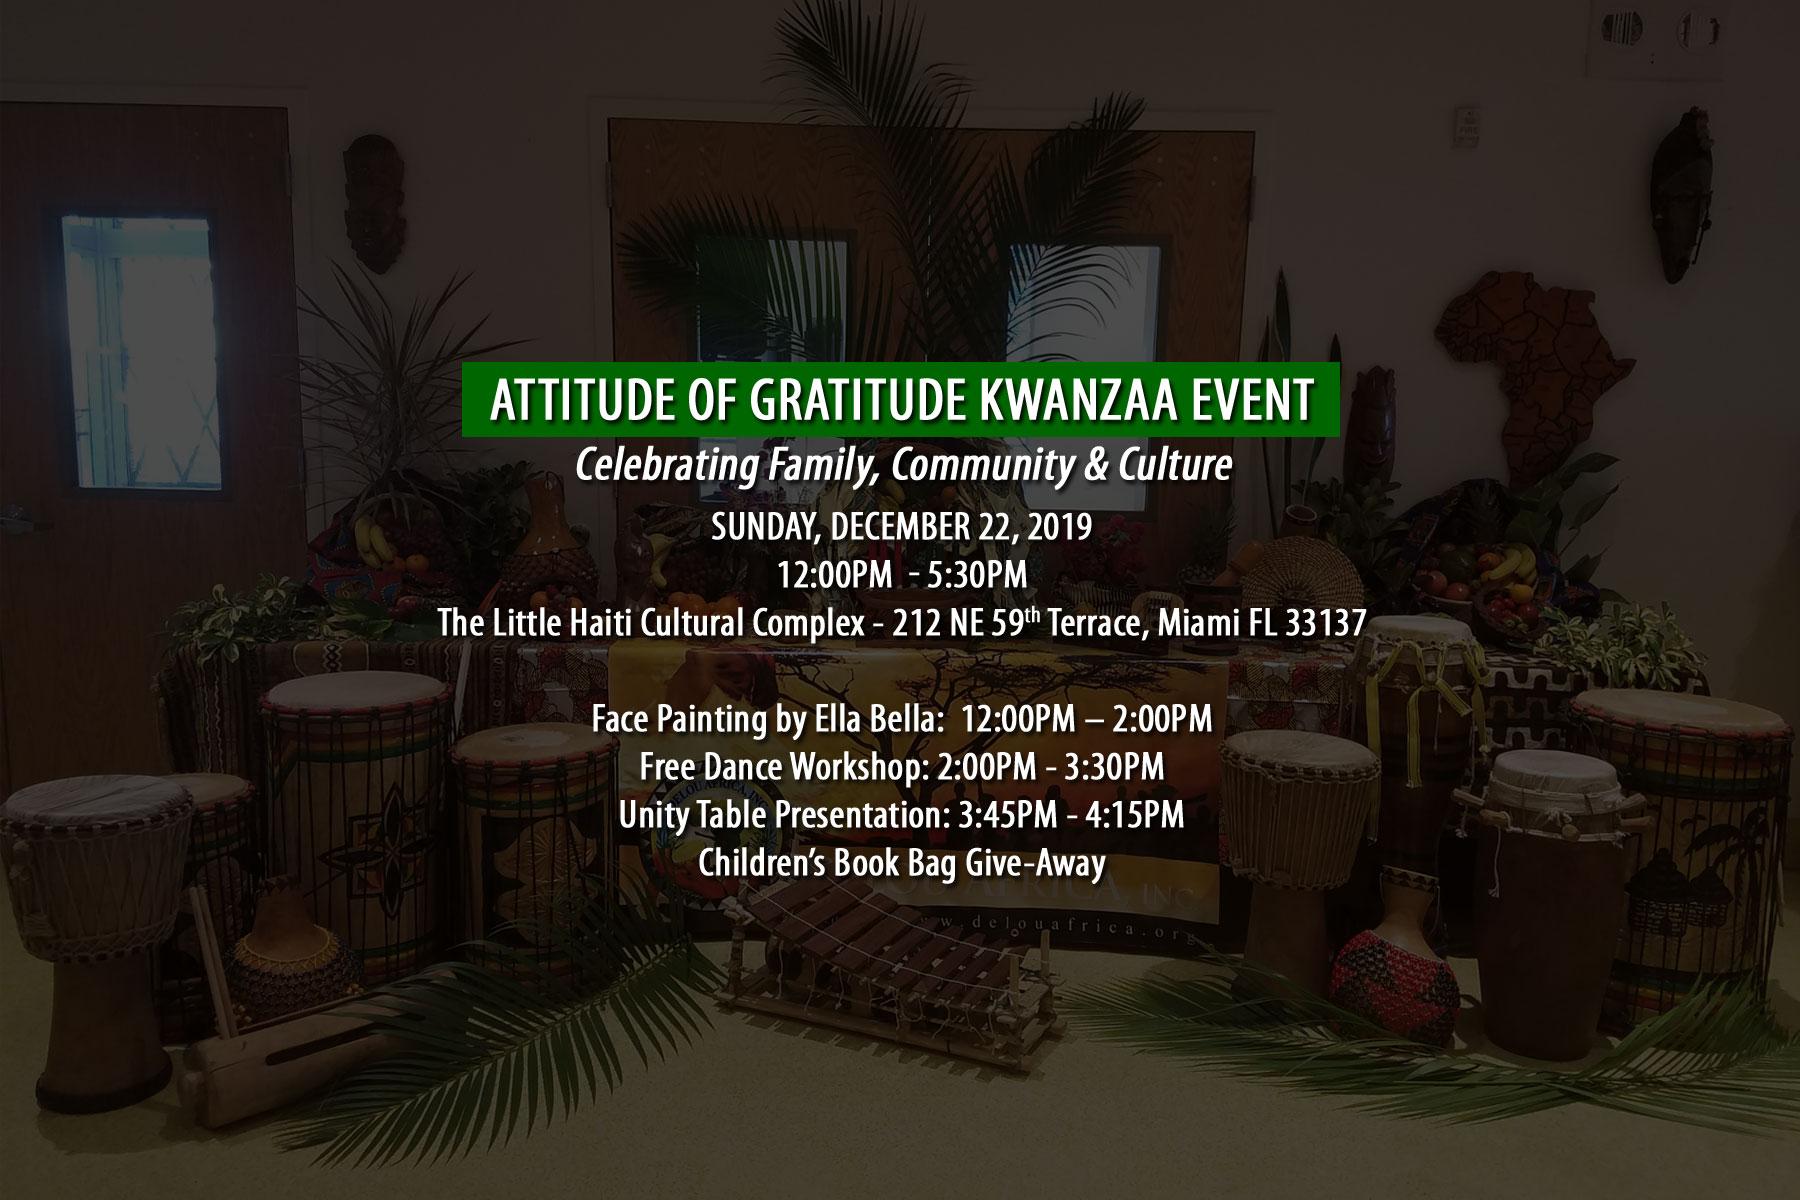 2019 Kwanzaa event announcement